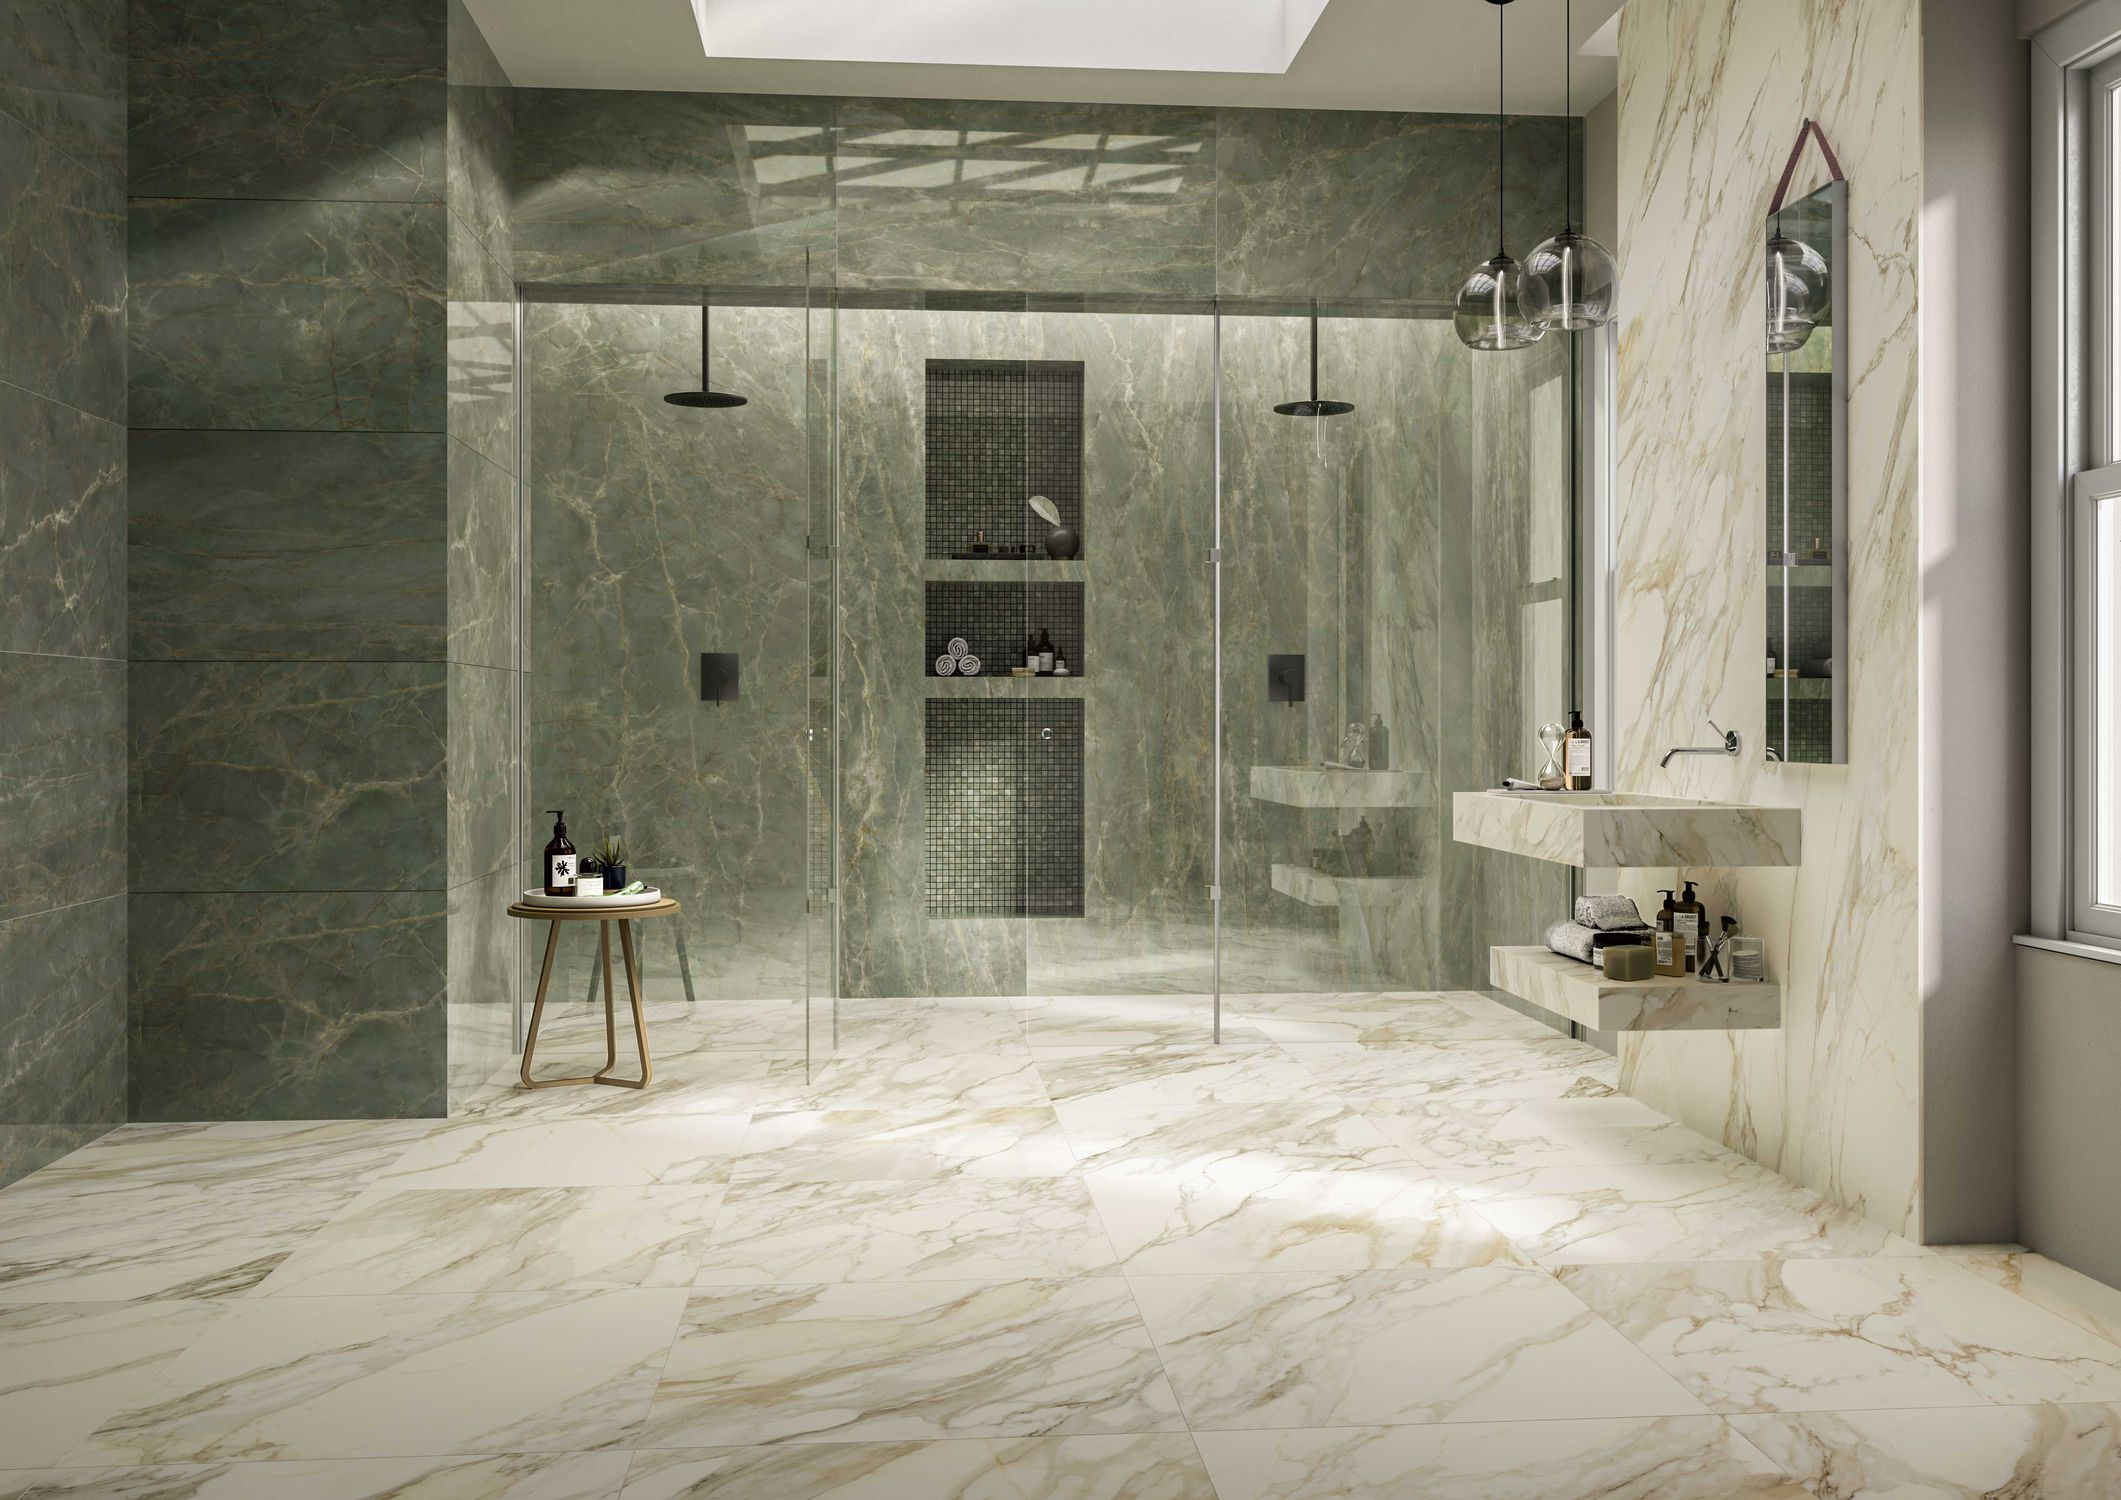 Indoor Tile Anima Ever Sage Green Ceramiche Caesar Wall Floor Porcelain Stoneware